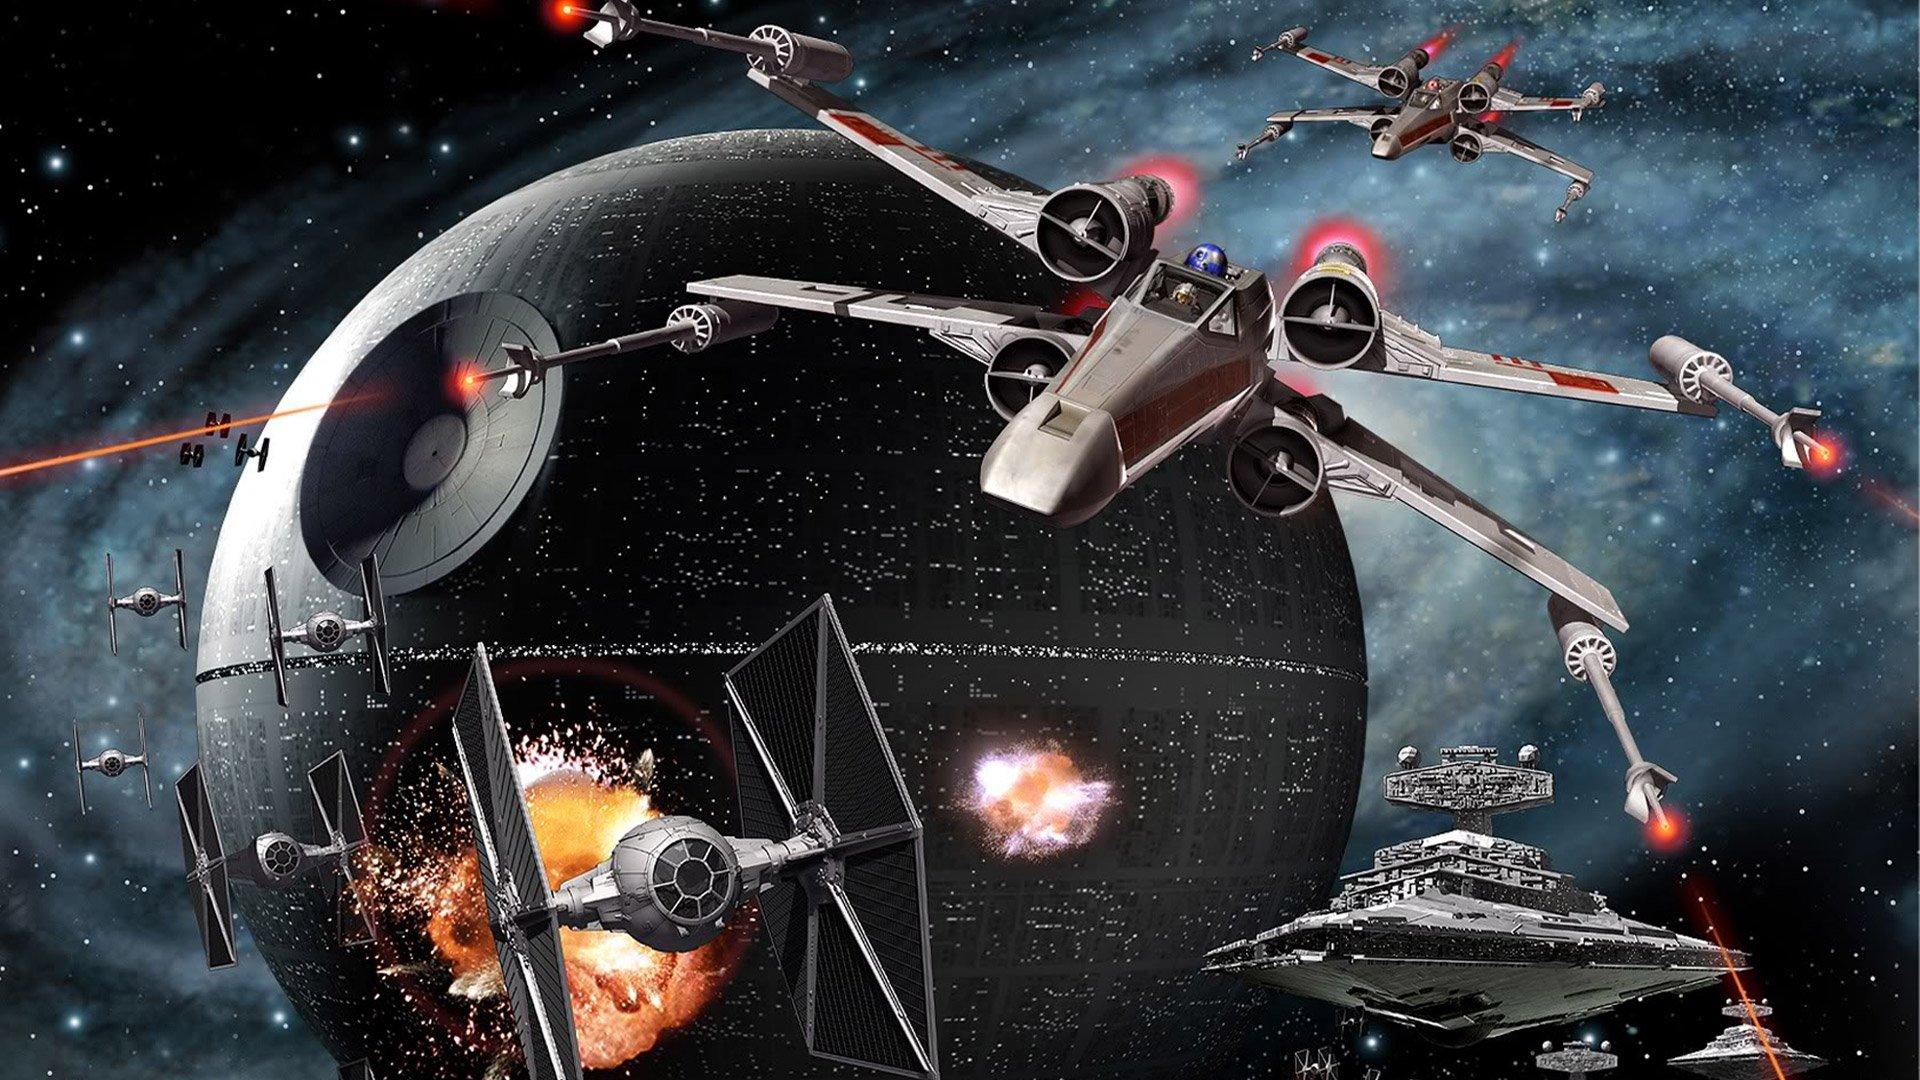 High Res Star Wars Wallpaper